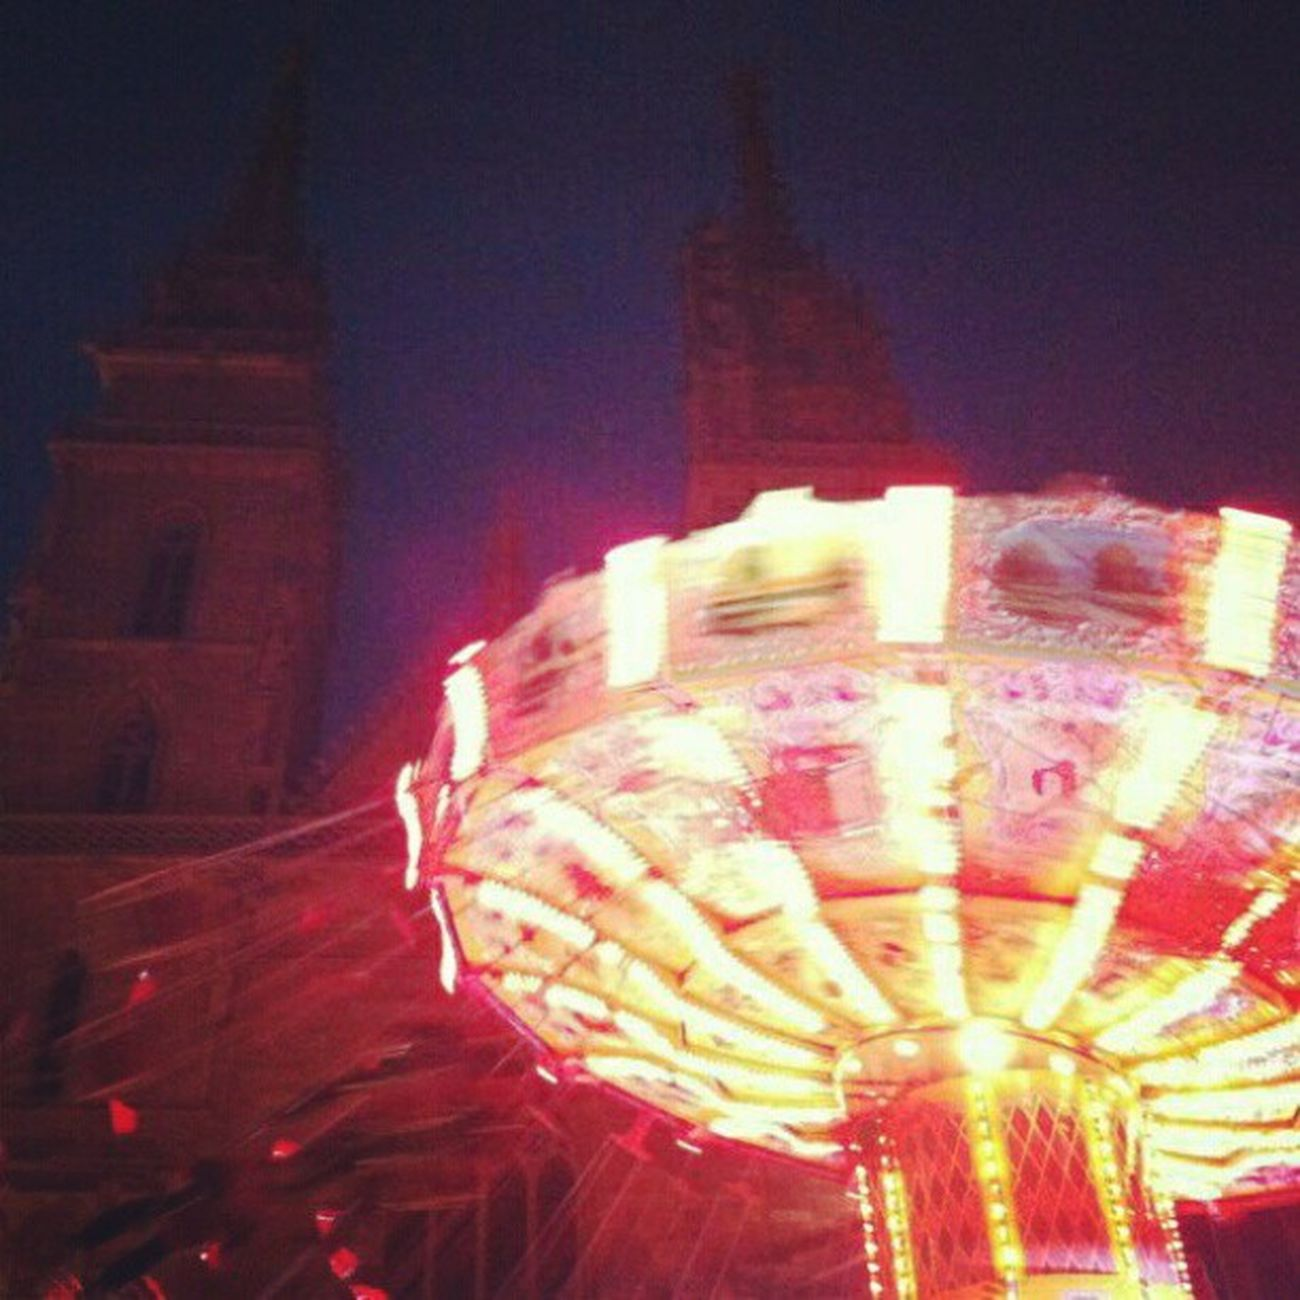 Christmasmarket Christmas Market Funrides fun rides basel Switzerland winter 2012 munsterplatz munster platz